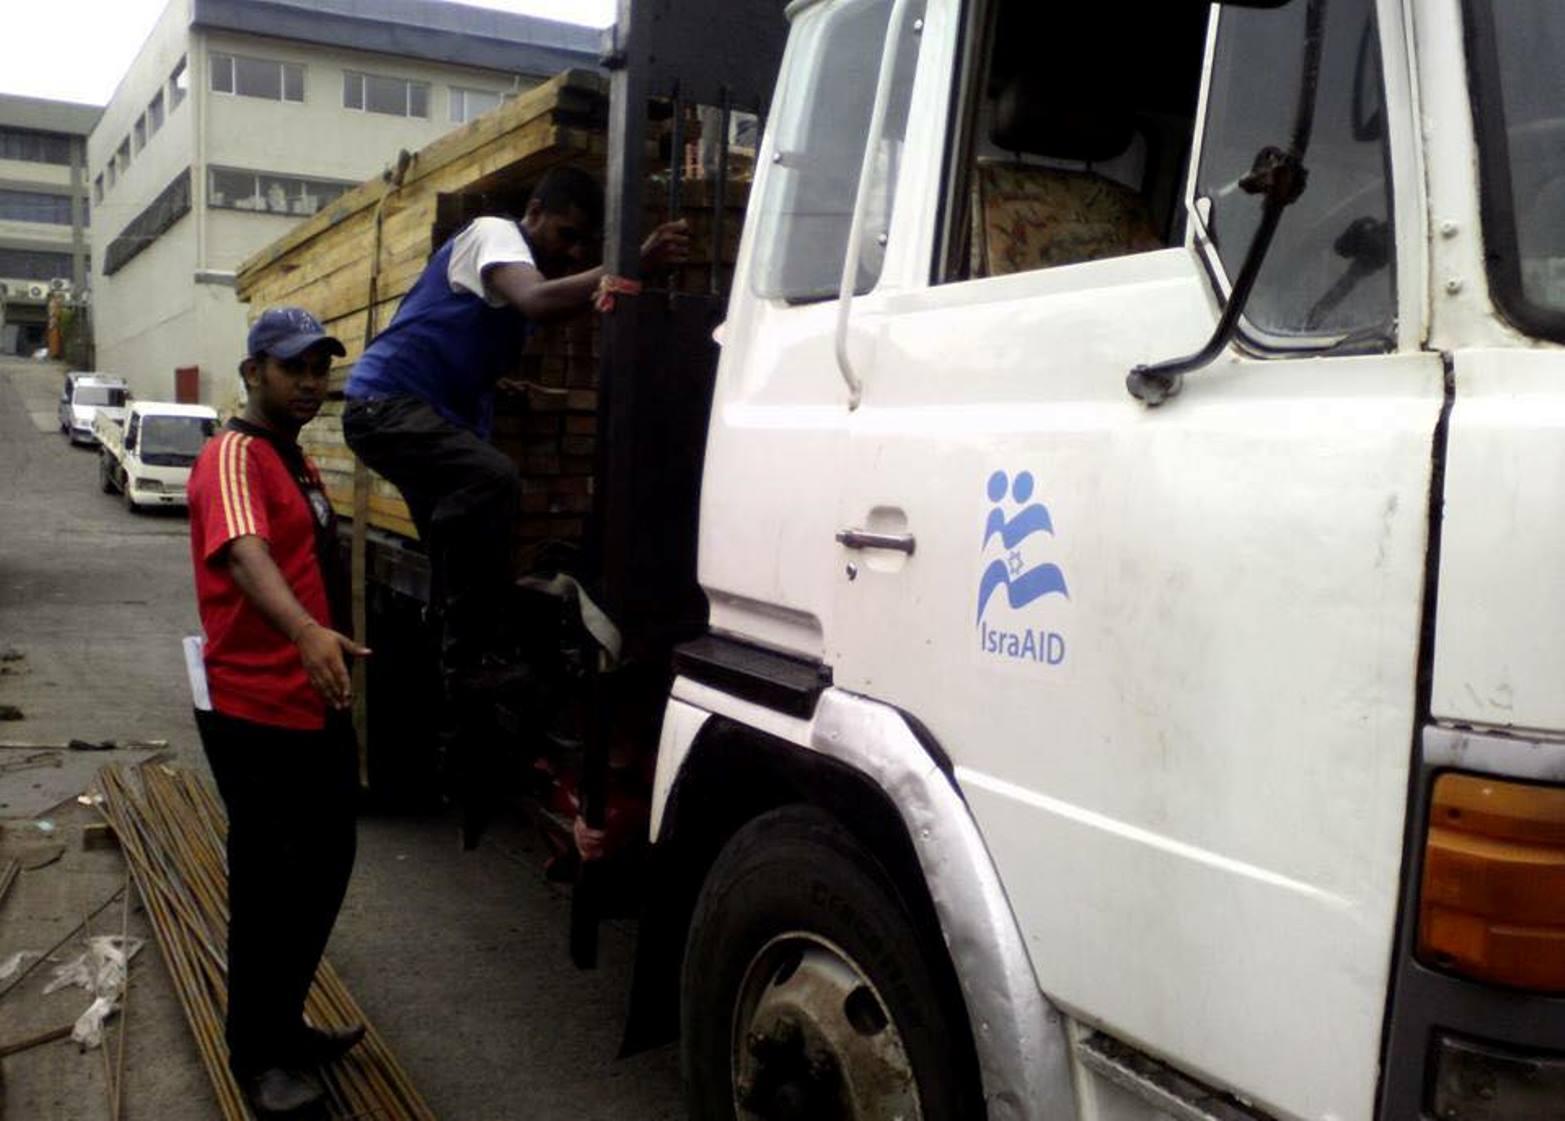 IsraAID is distributing building supplies in Fiji. Photo via Facebook